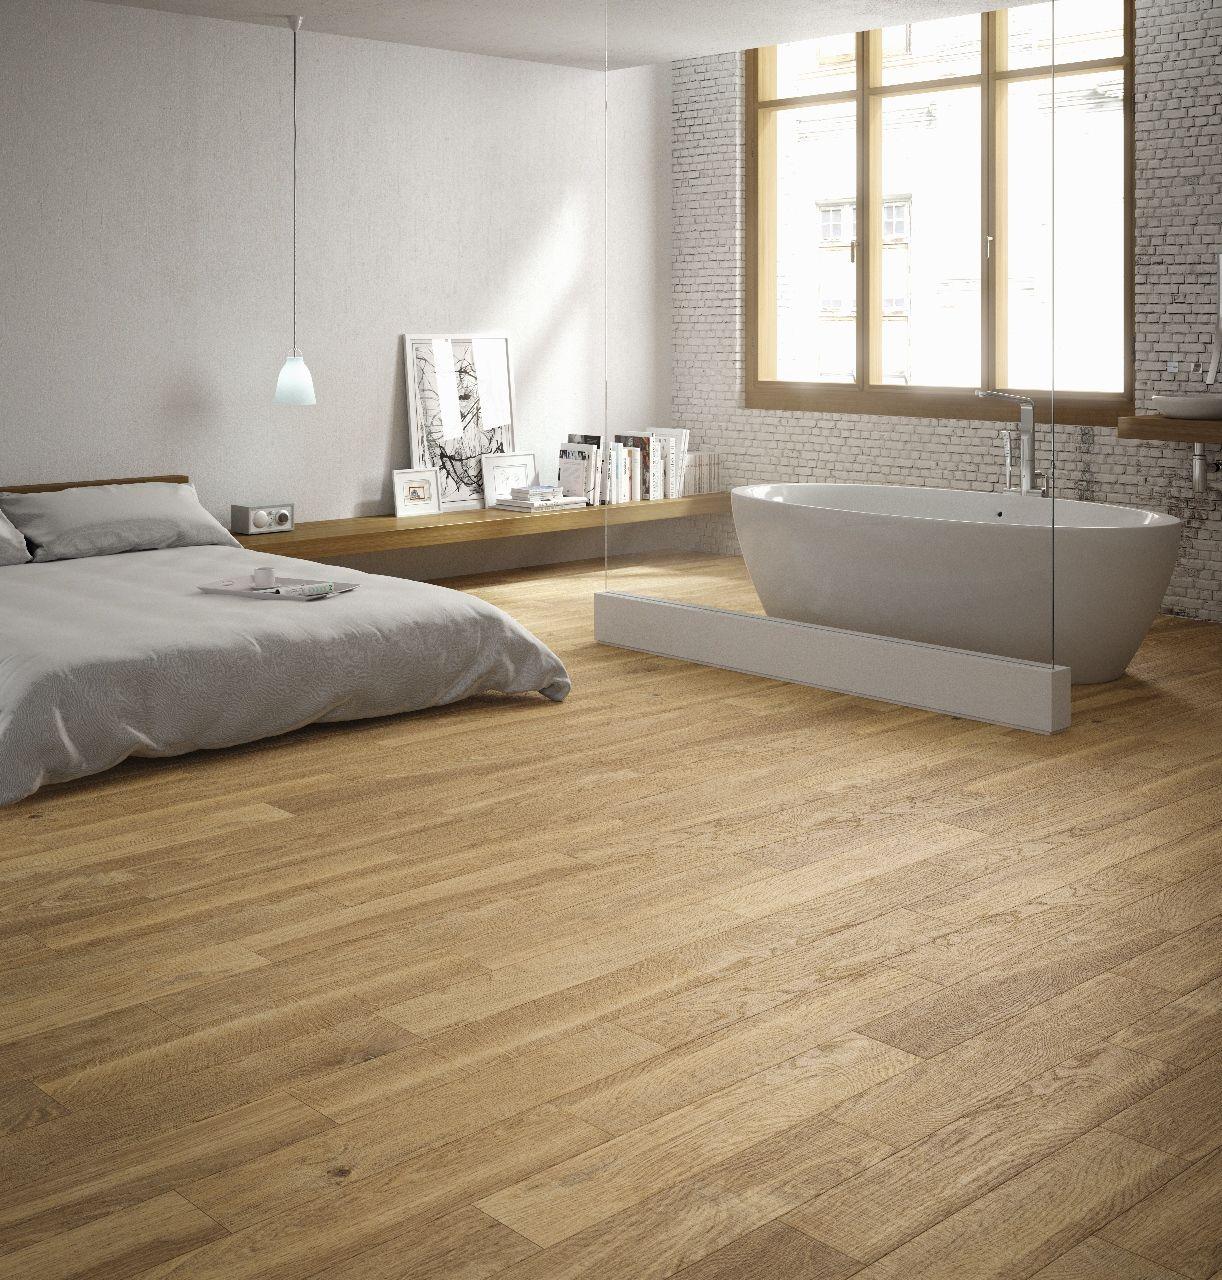 grespania amazonia roble 15x80 porcelain wood effect floor tile